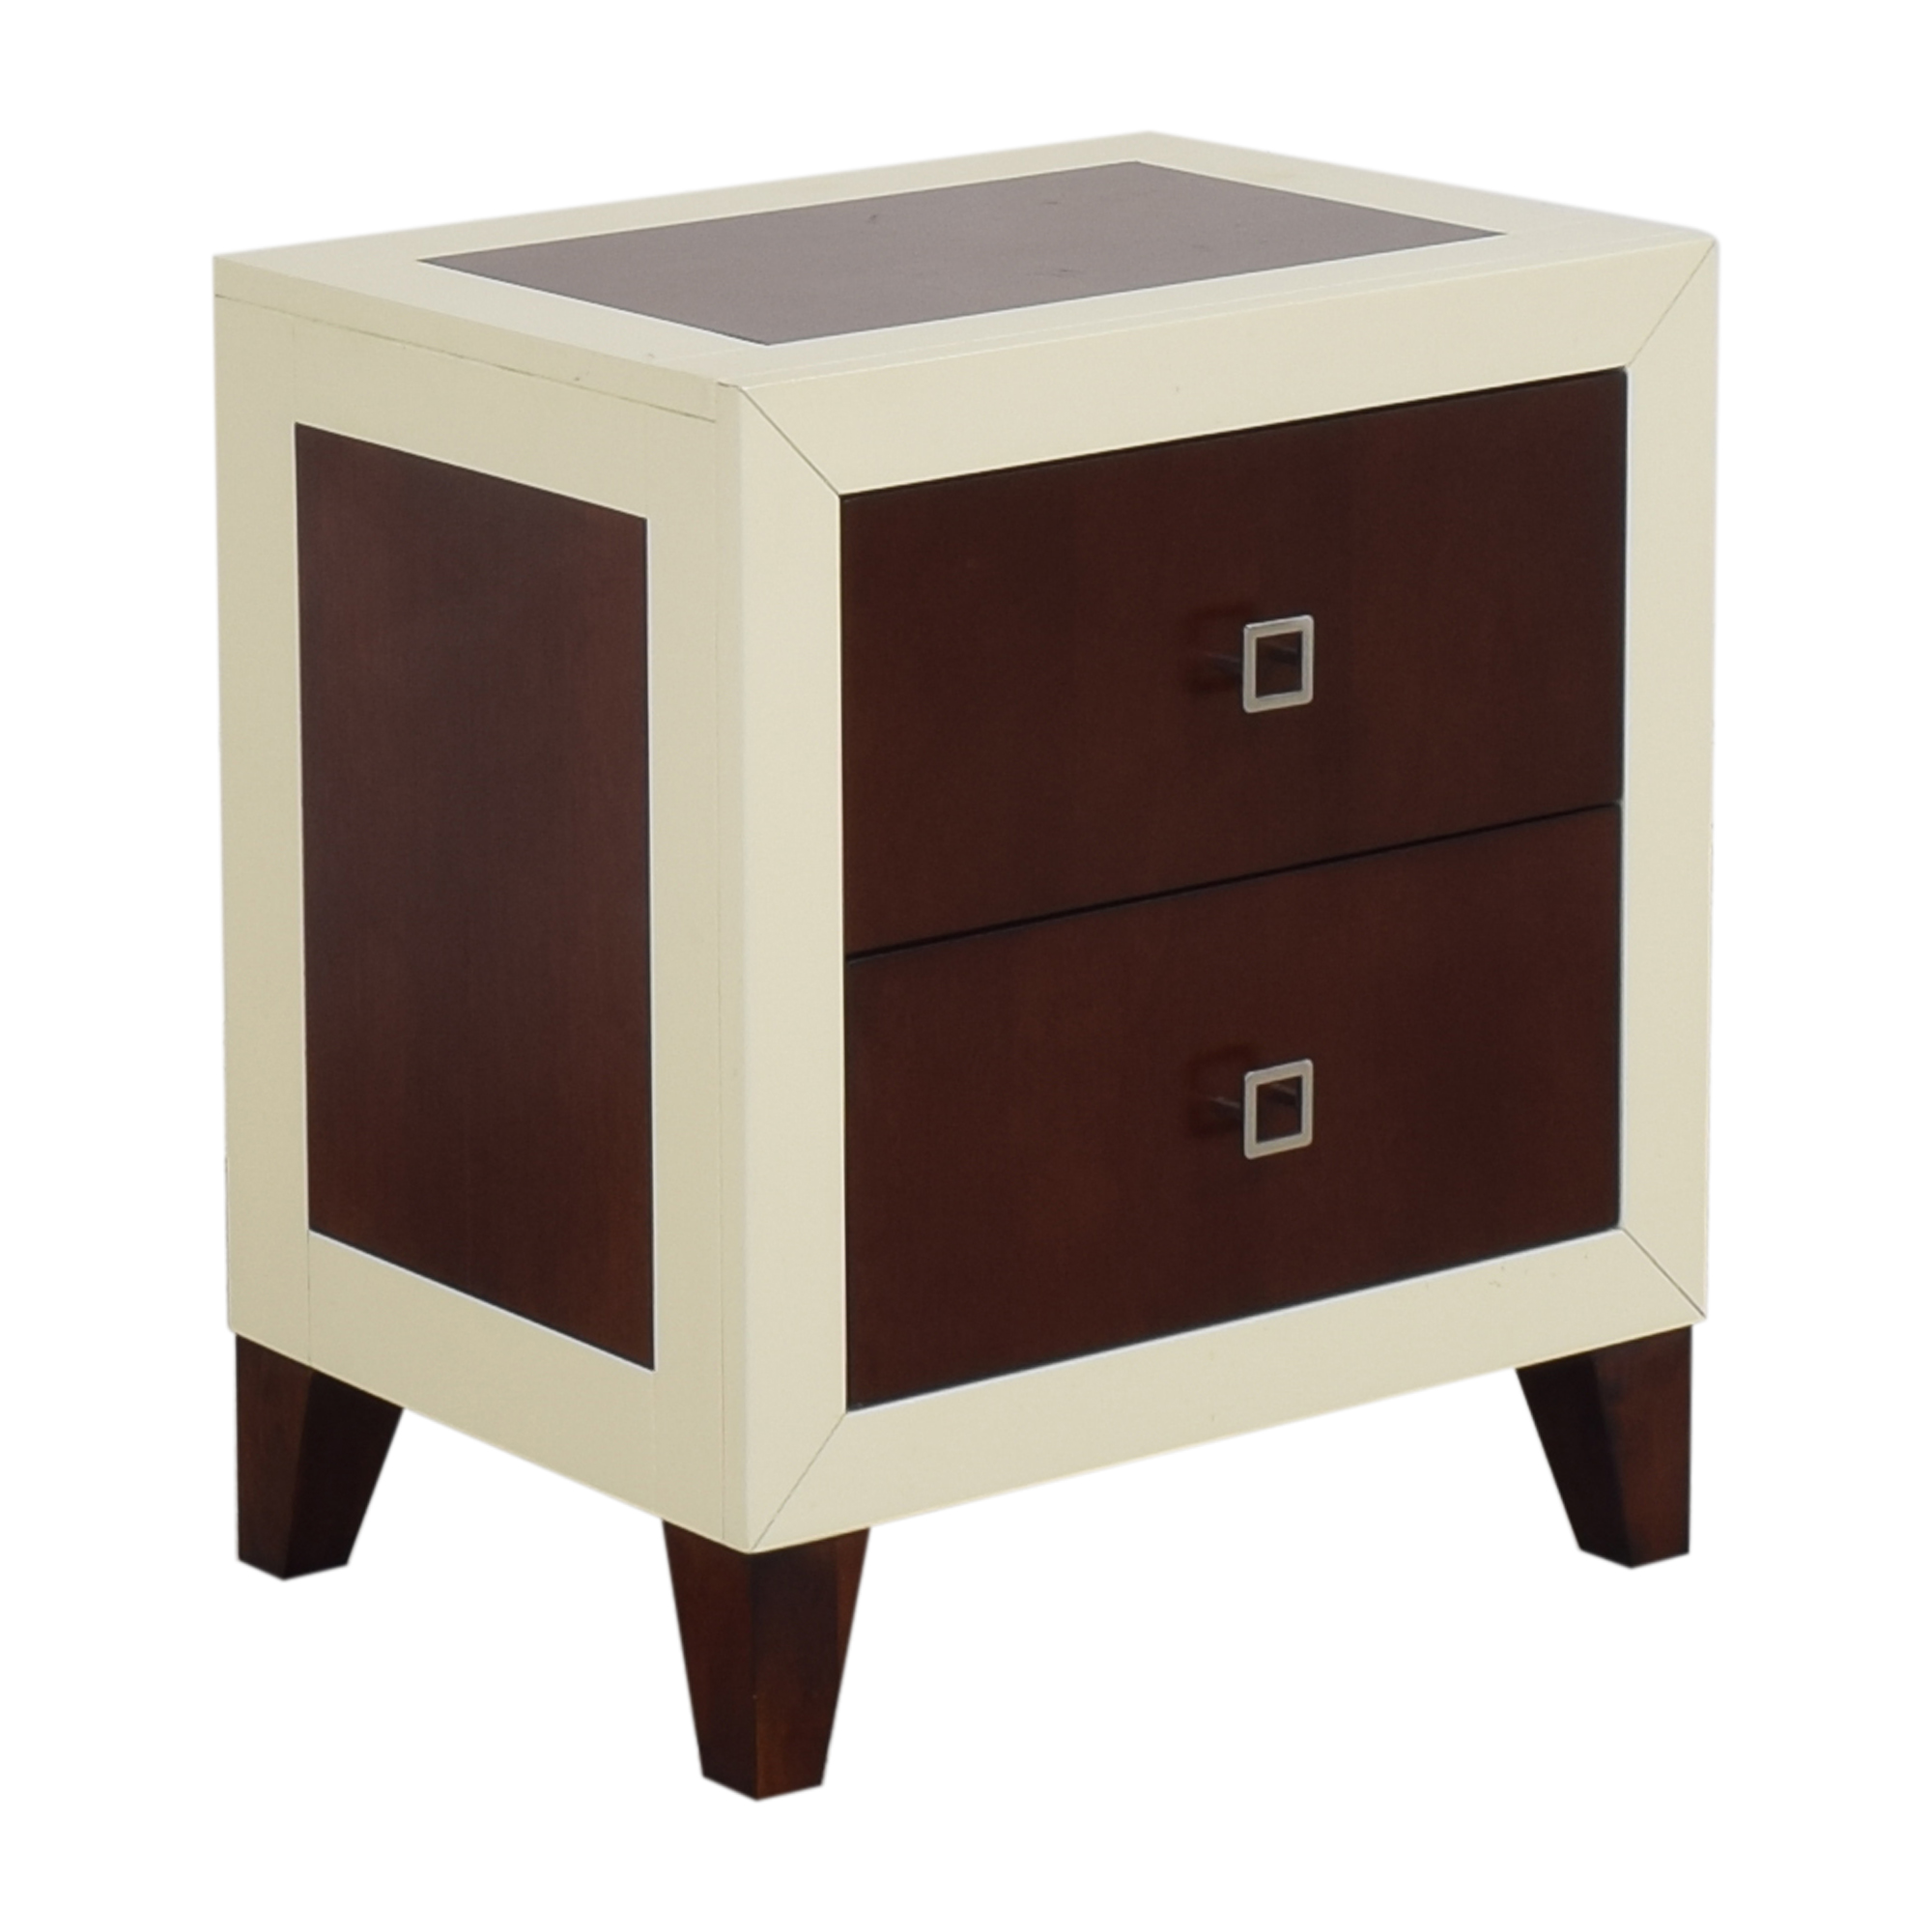 Najarian Furniture Najarian Furniture Zeno Nightstand brown & off white